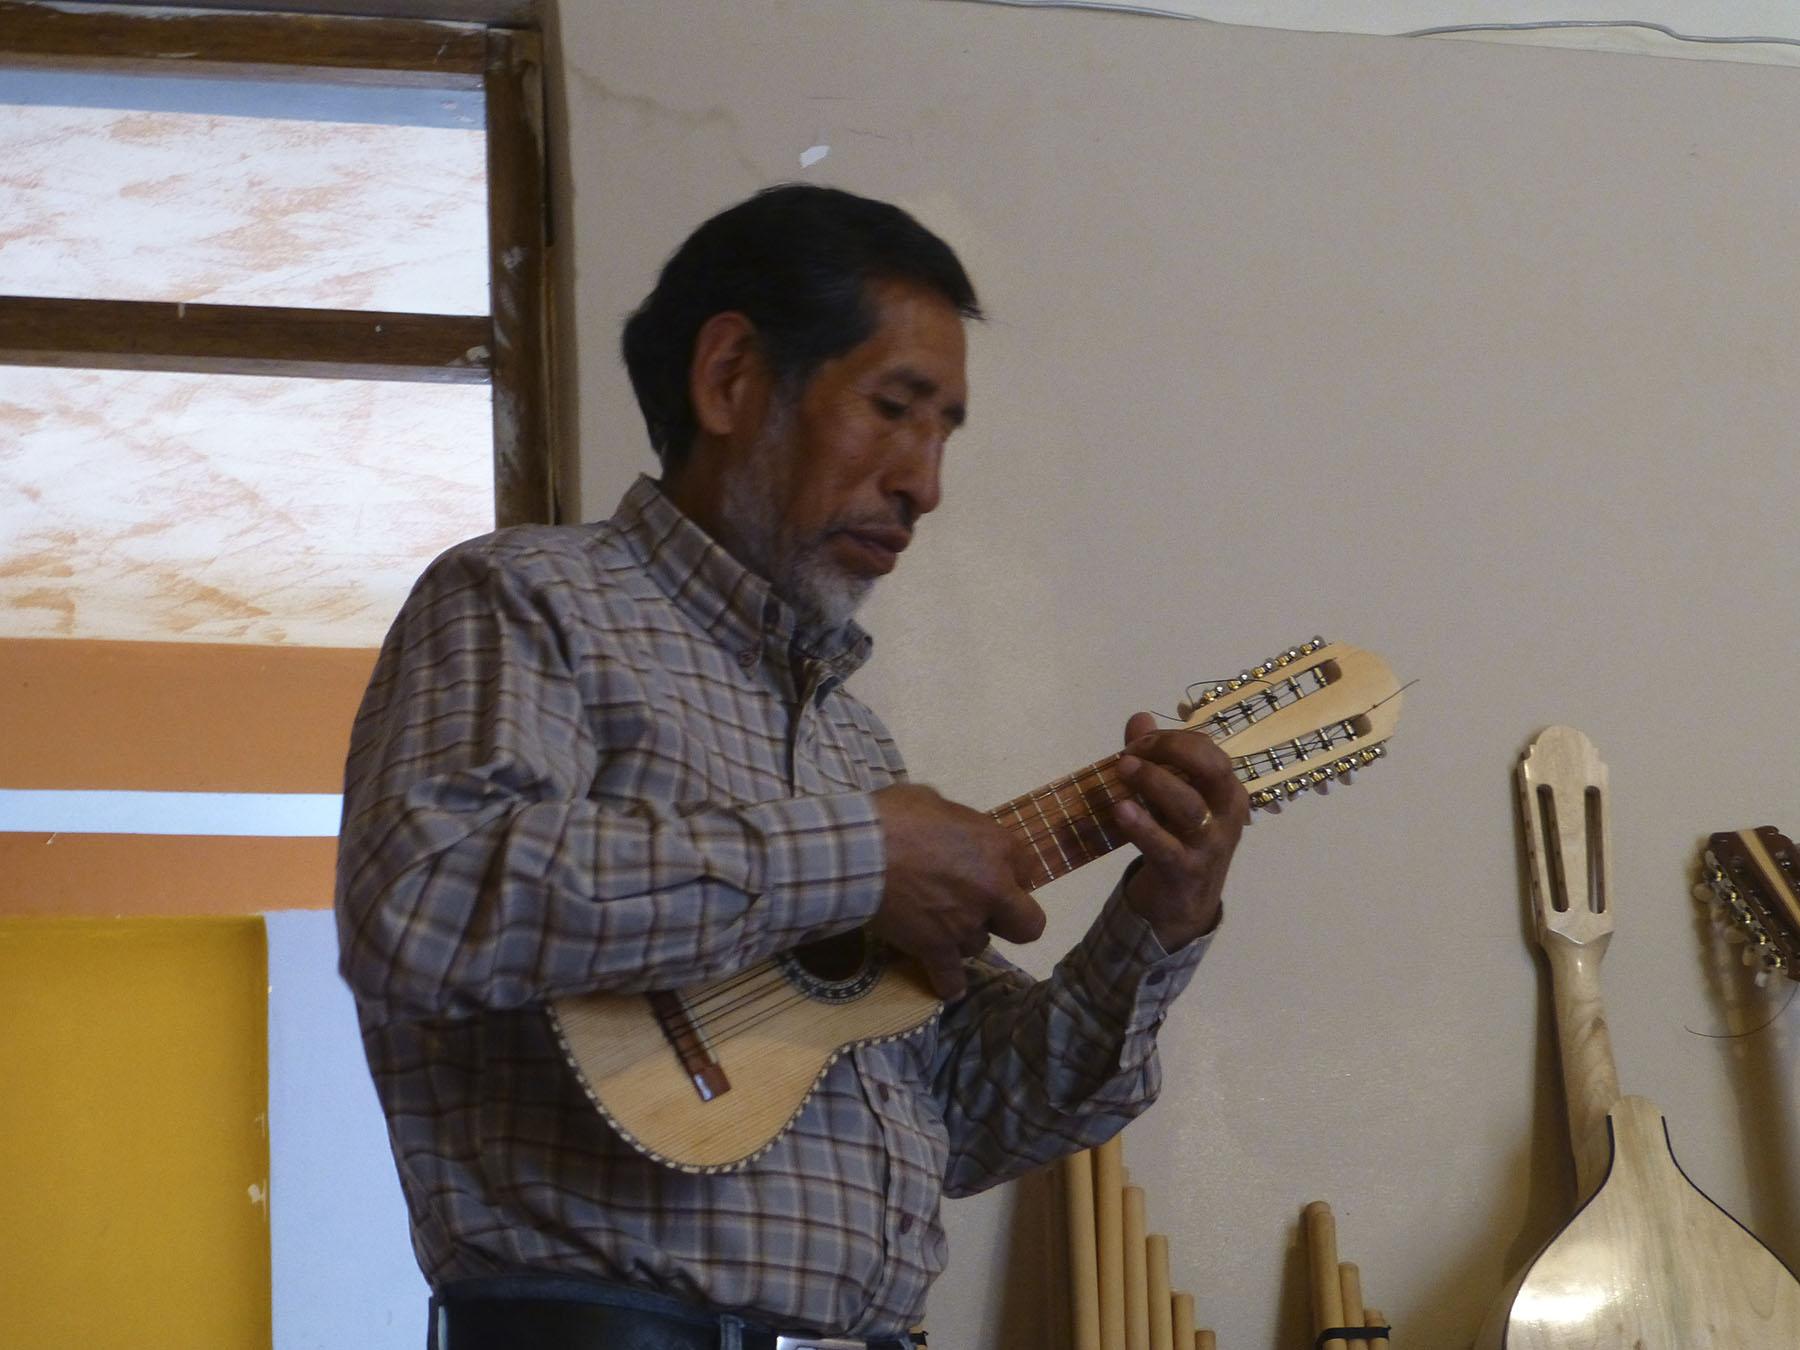 Crafstman and musician